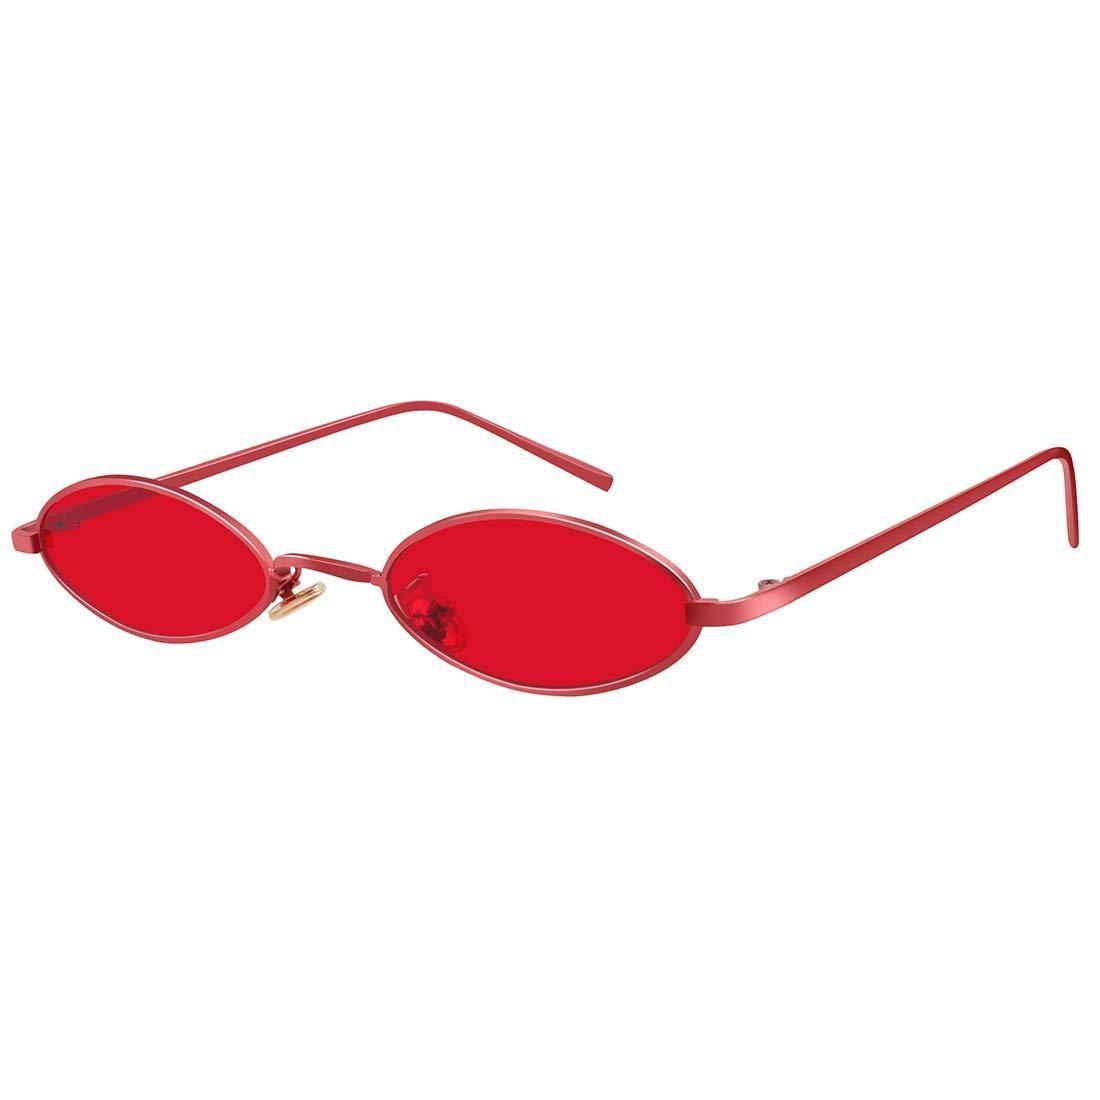 c9a40487b3 ROYAL GIRL Vintage Oval Sunglasses Small Metal Frames Designer Gothic  Glasses